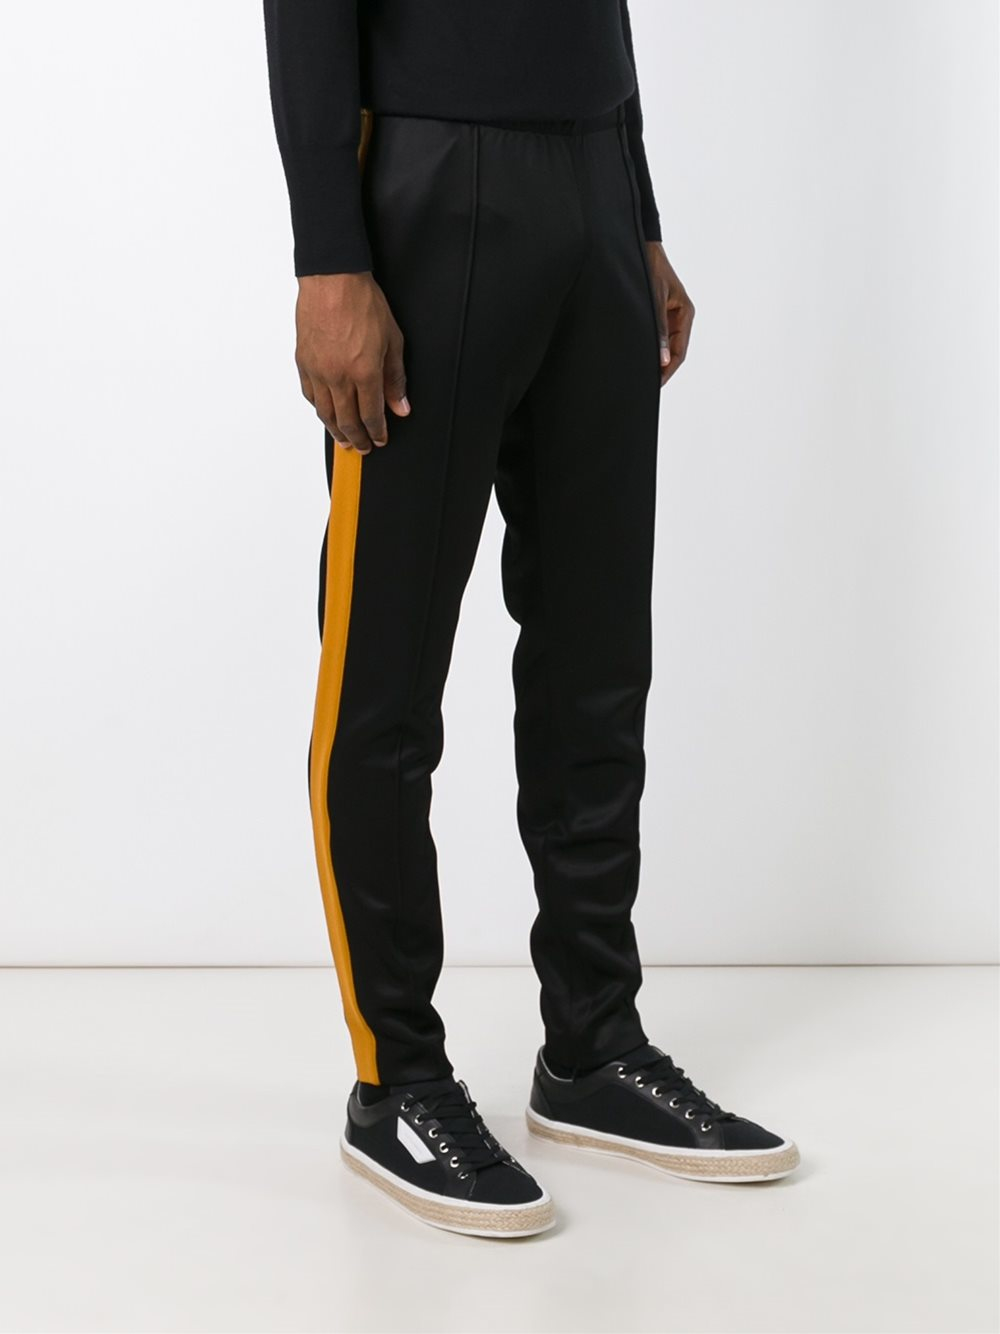 Burberry Side Stripe Trousers in Black for Men